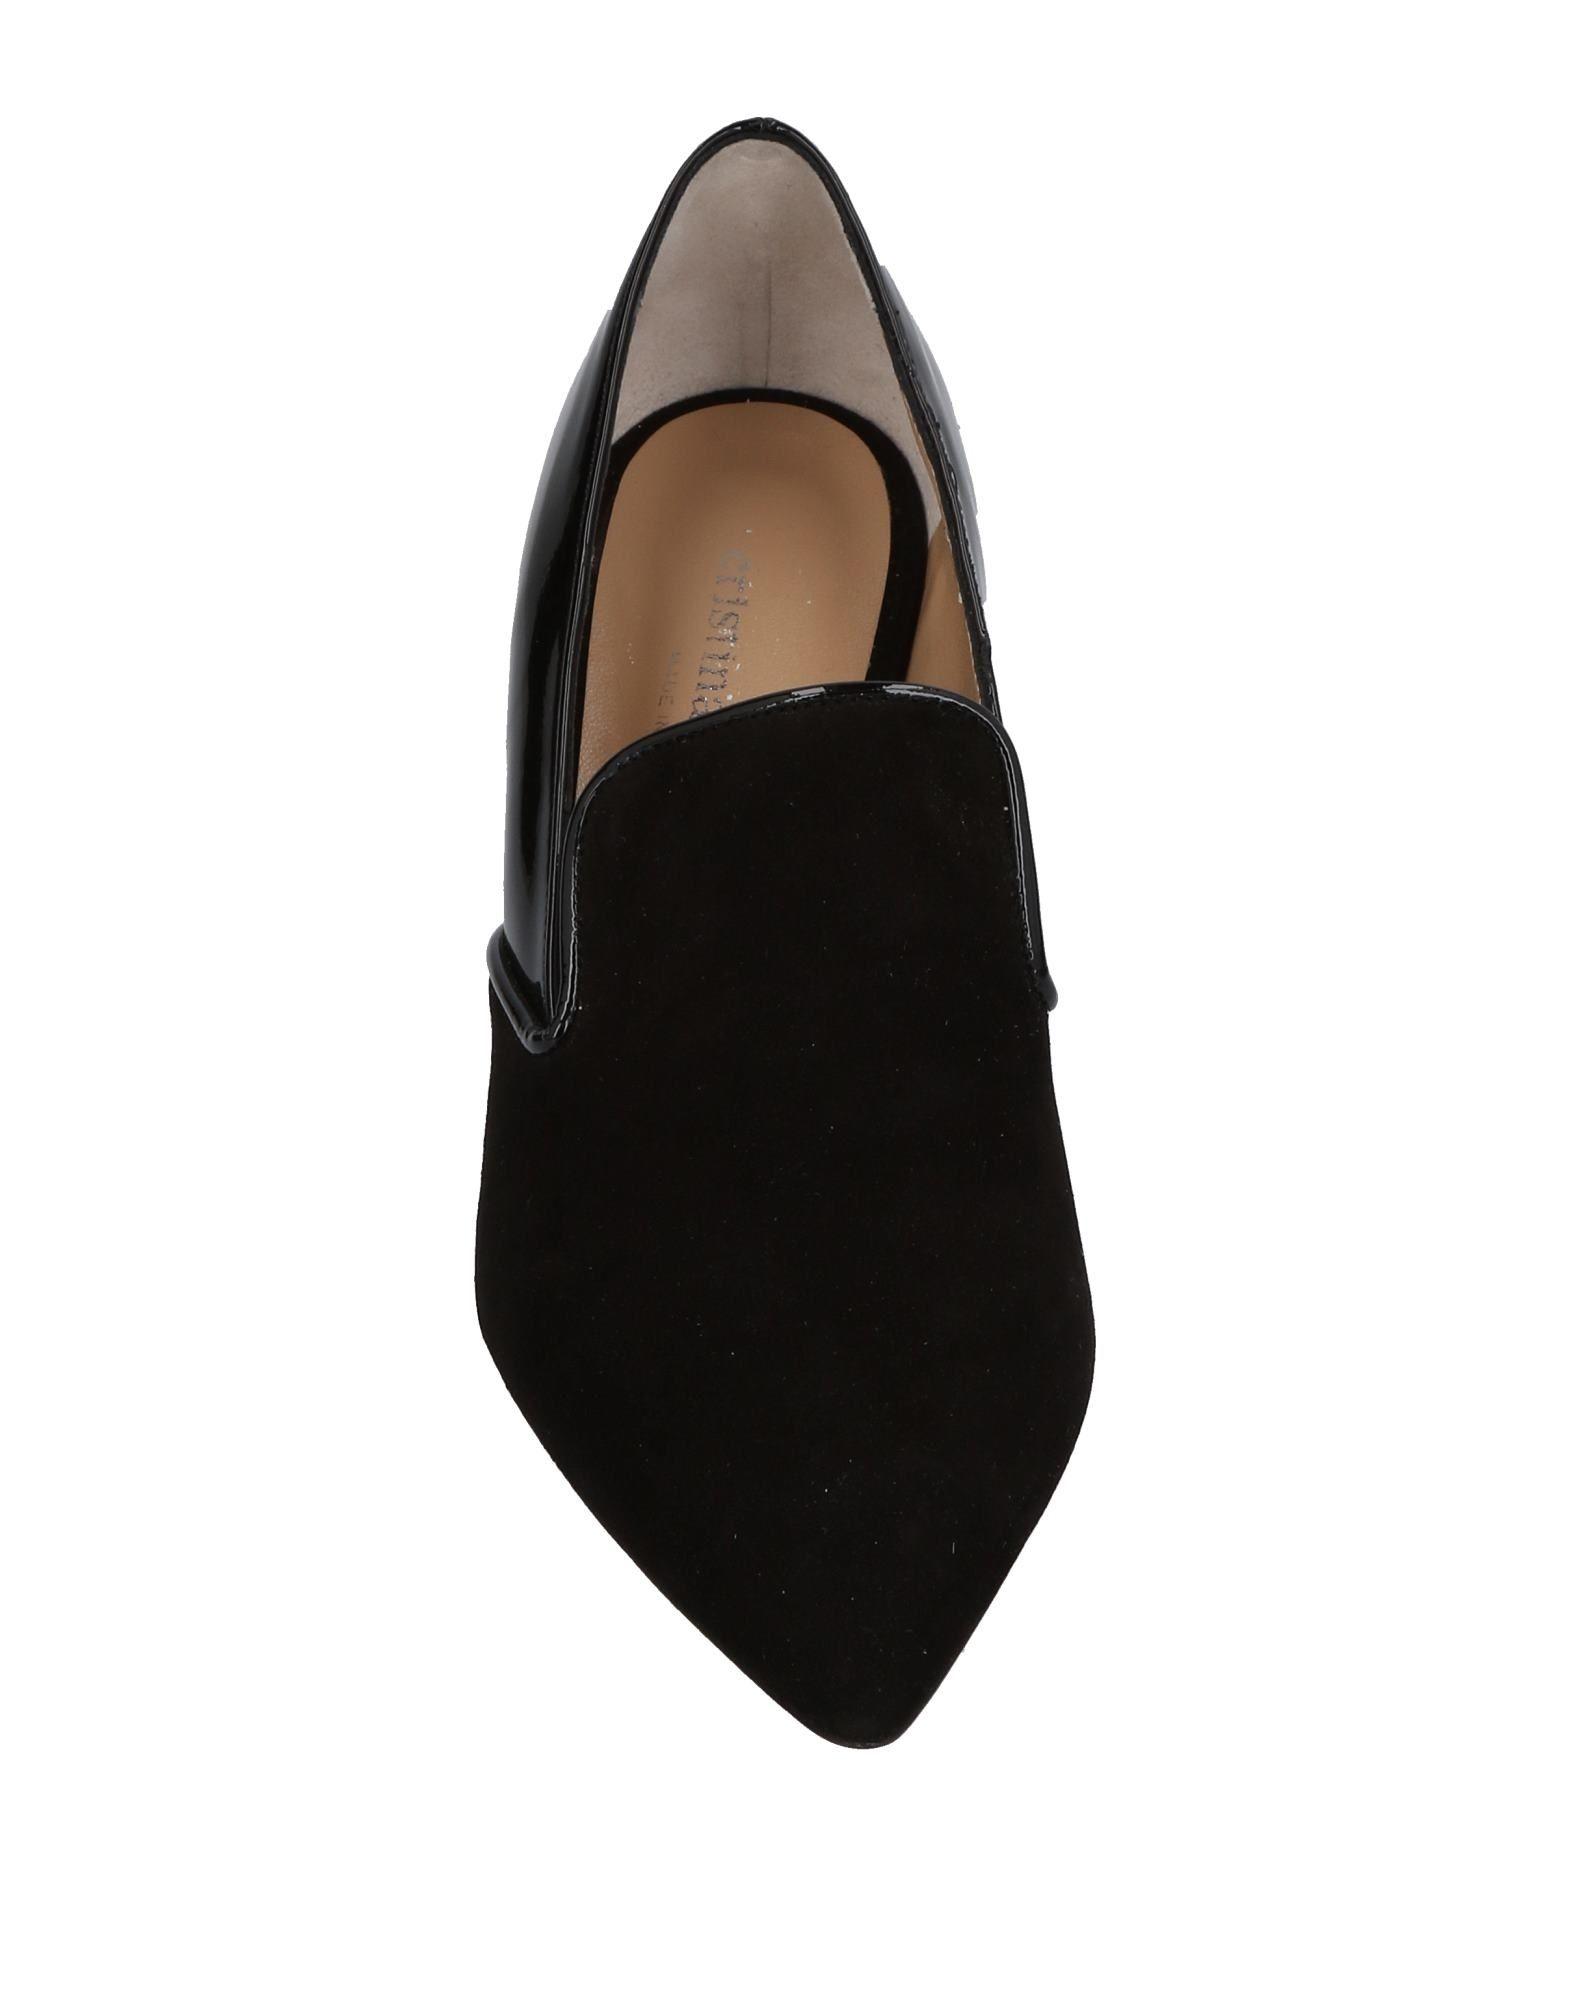 Cristina 11457782UH Millotti Mokassins Damen  11457782UH Cristina Gute Qualität beliebte Schuhe 105eb2